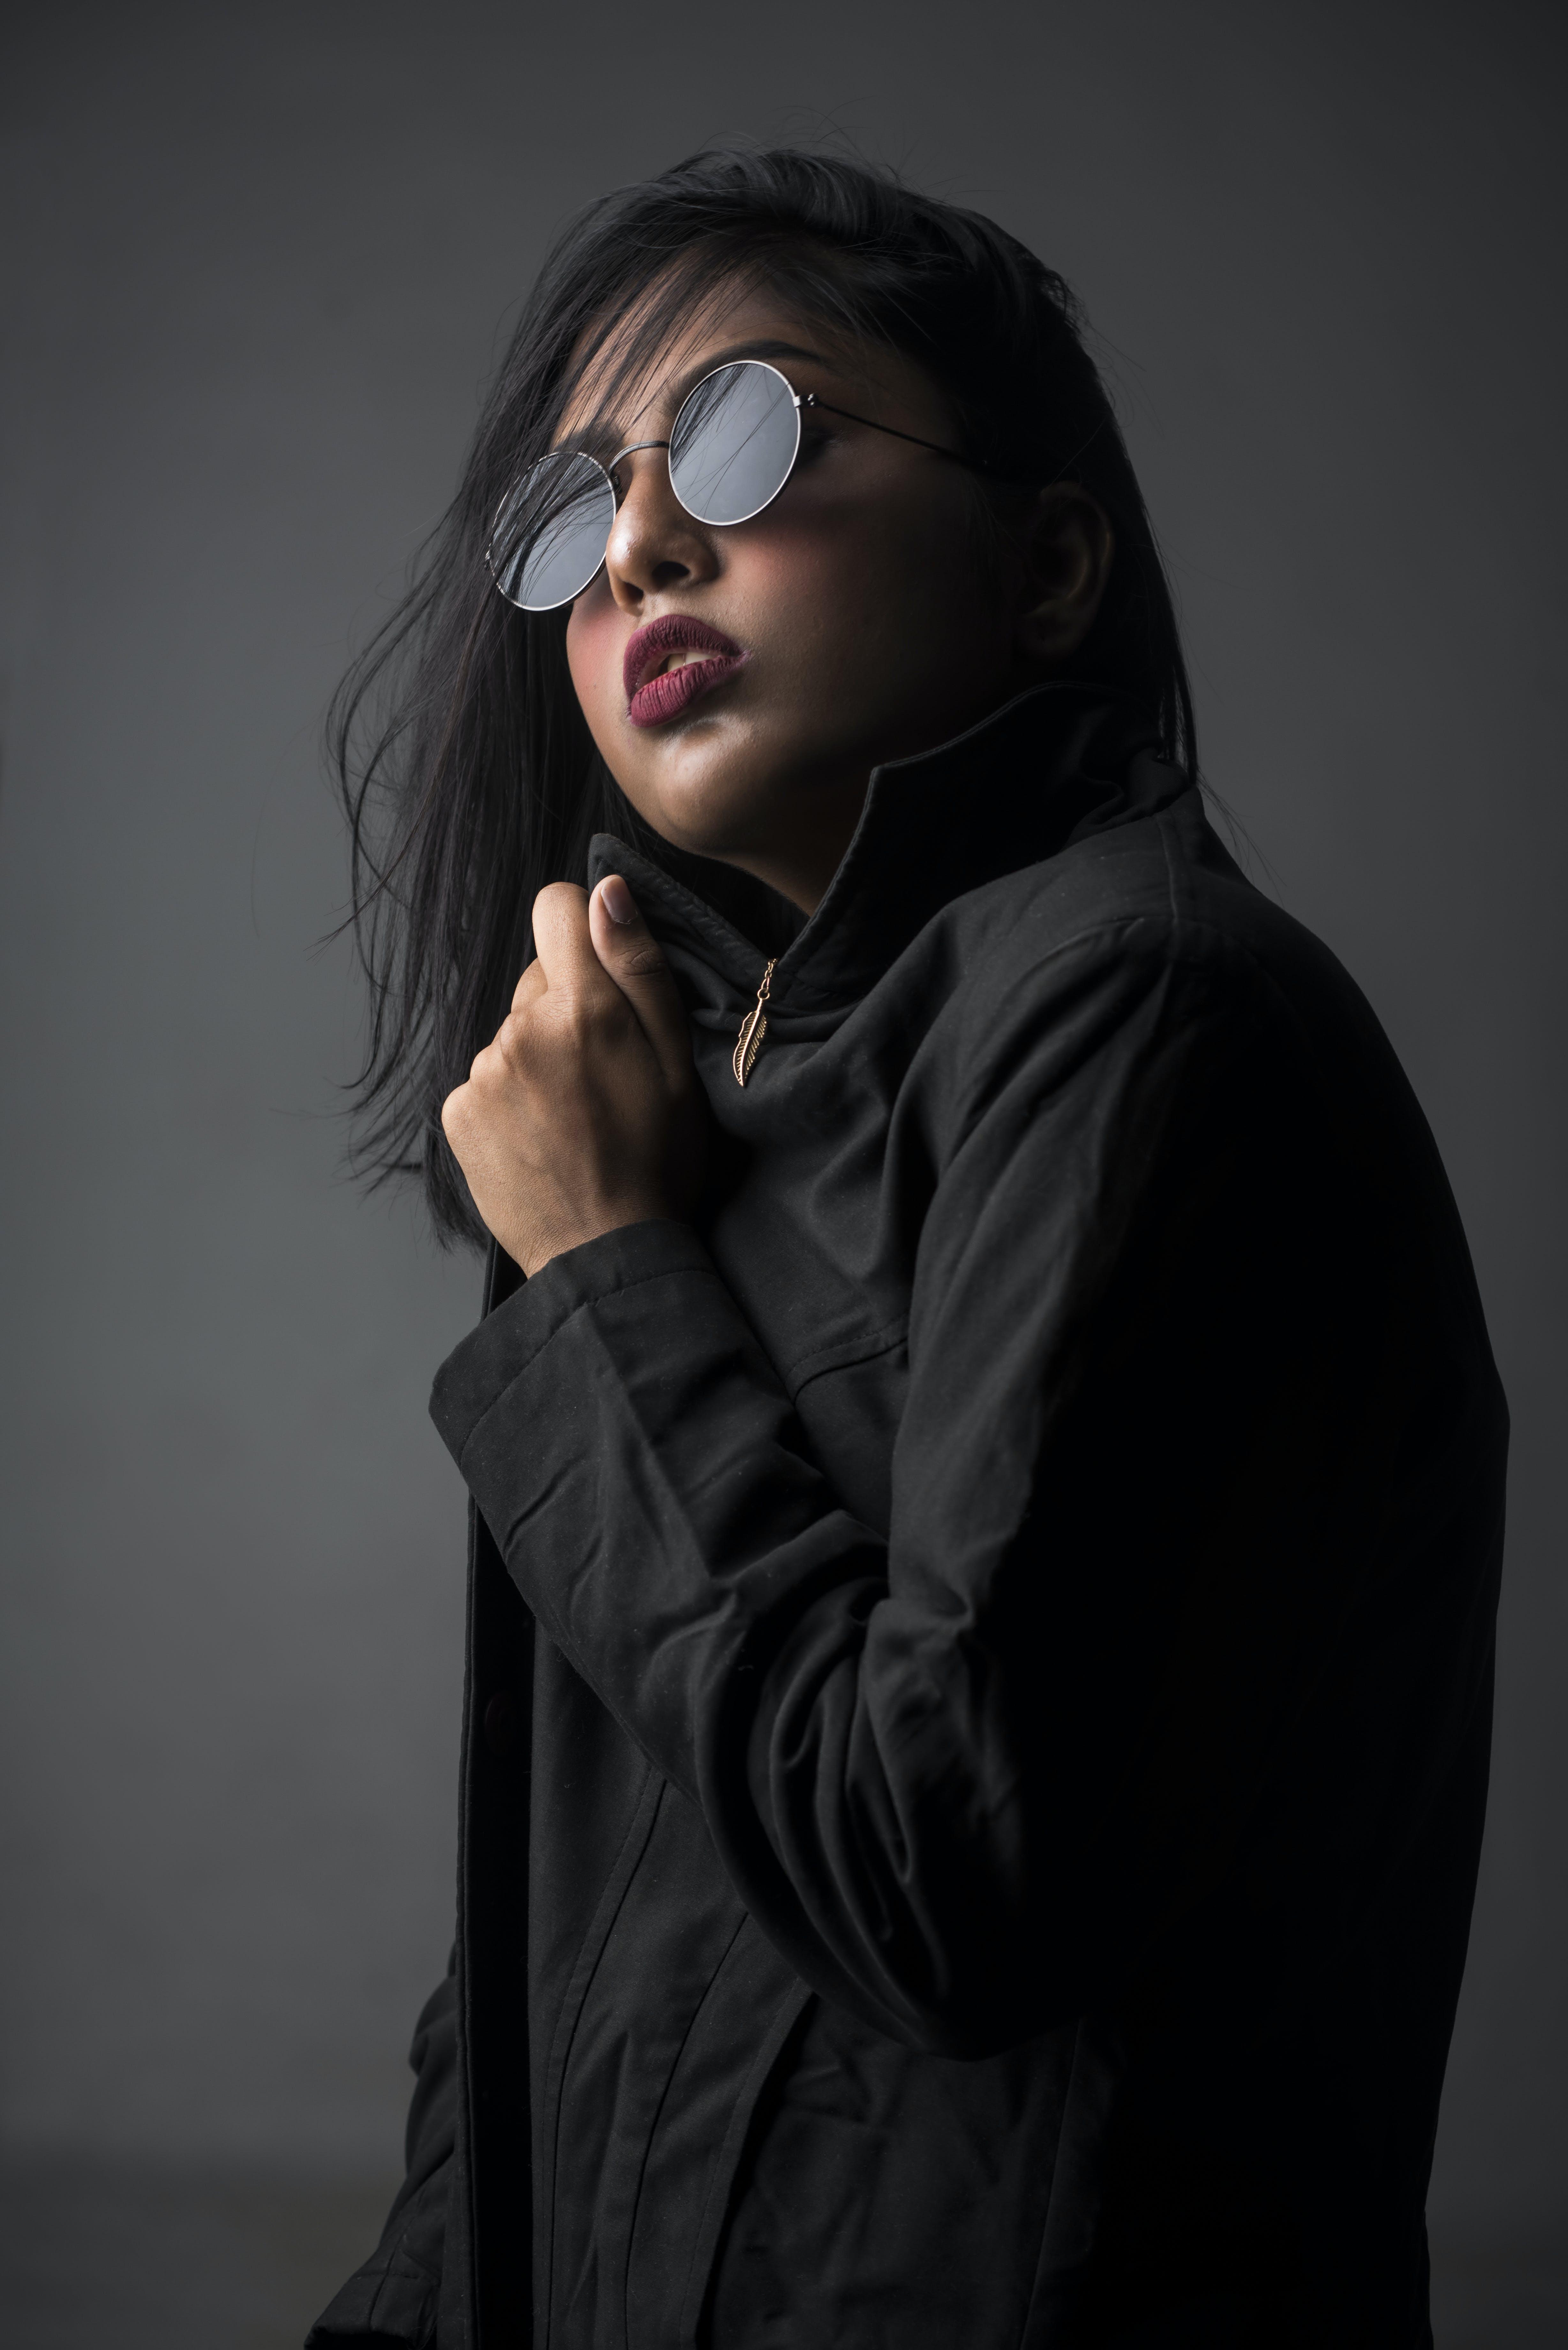 Woman Posing for Photo Shoot